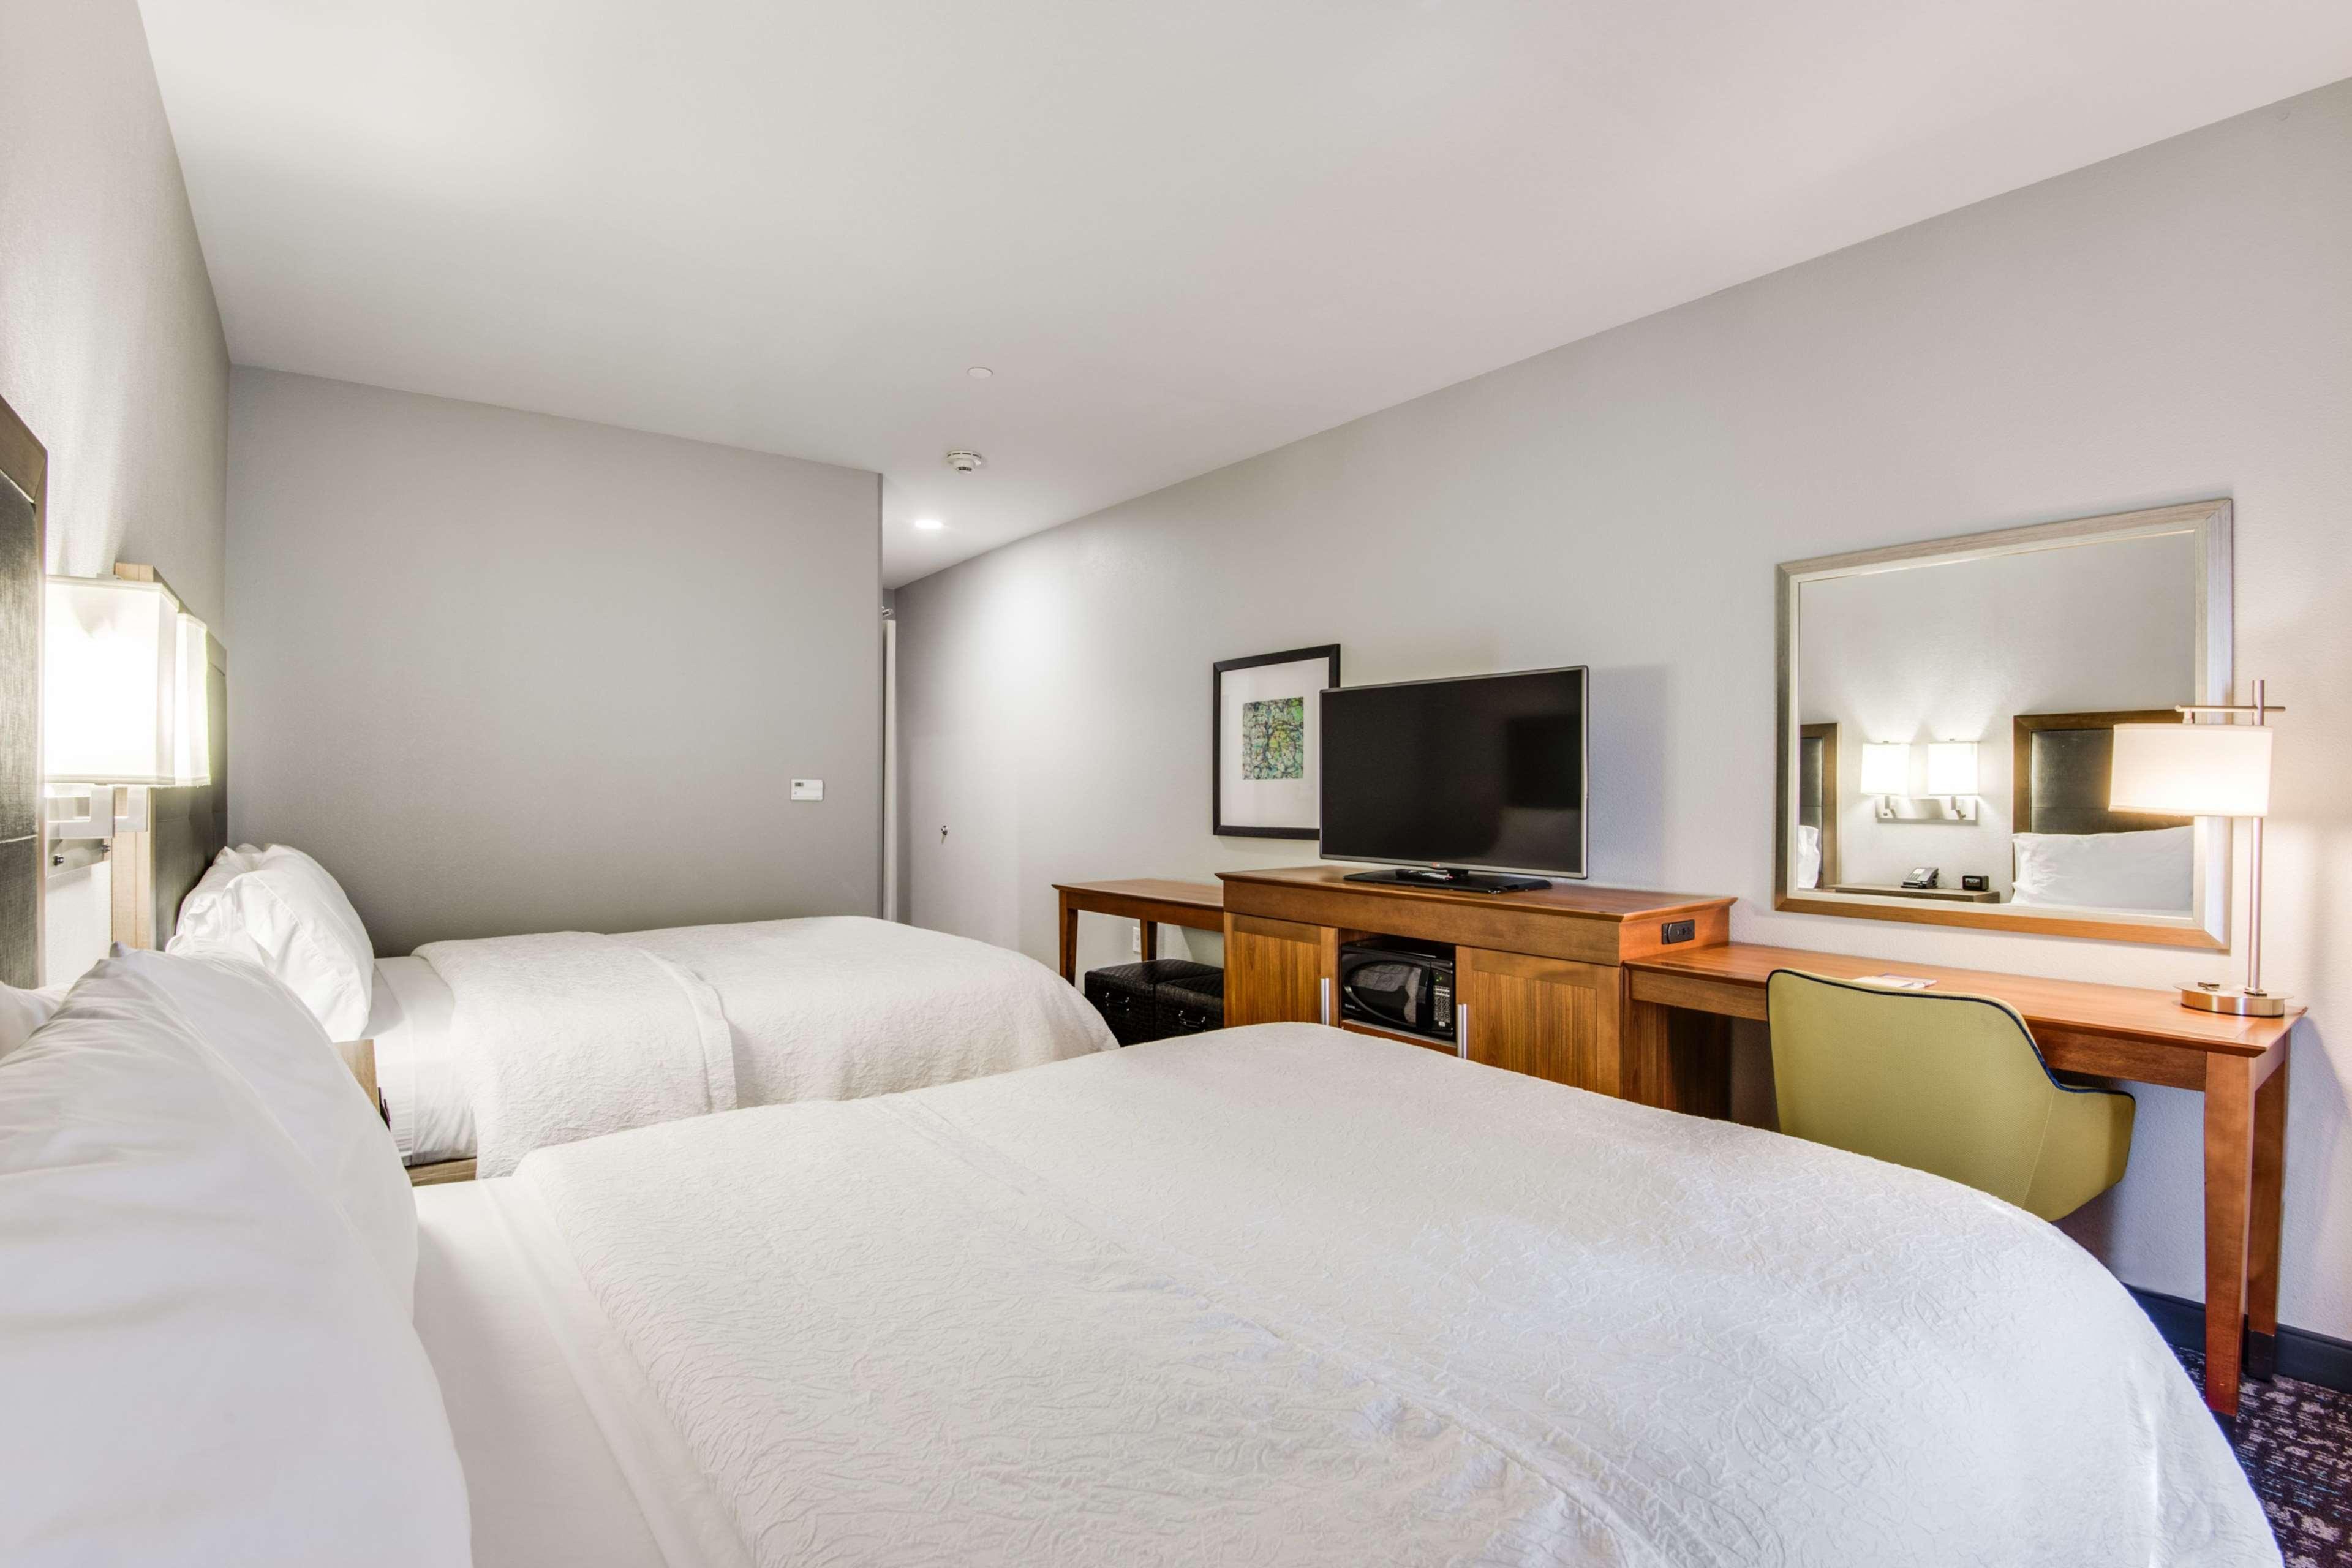 Hampton Inn & Suites Dallas/Ft. Worth Airport South image 16